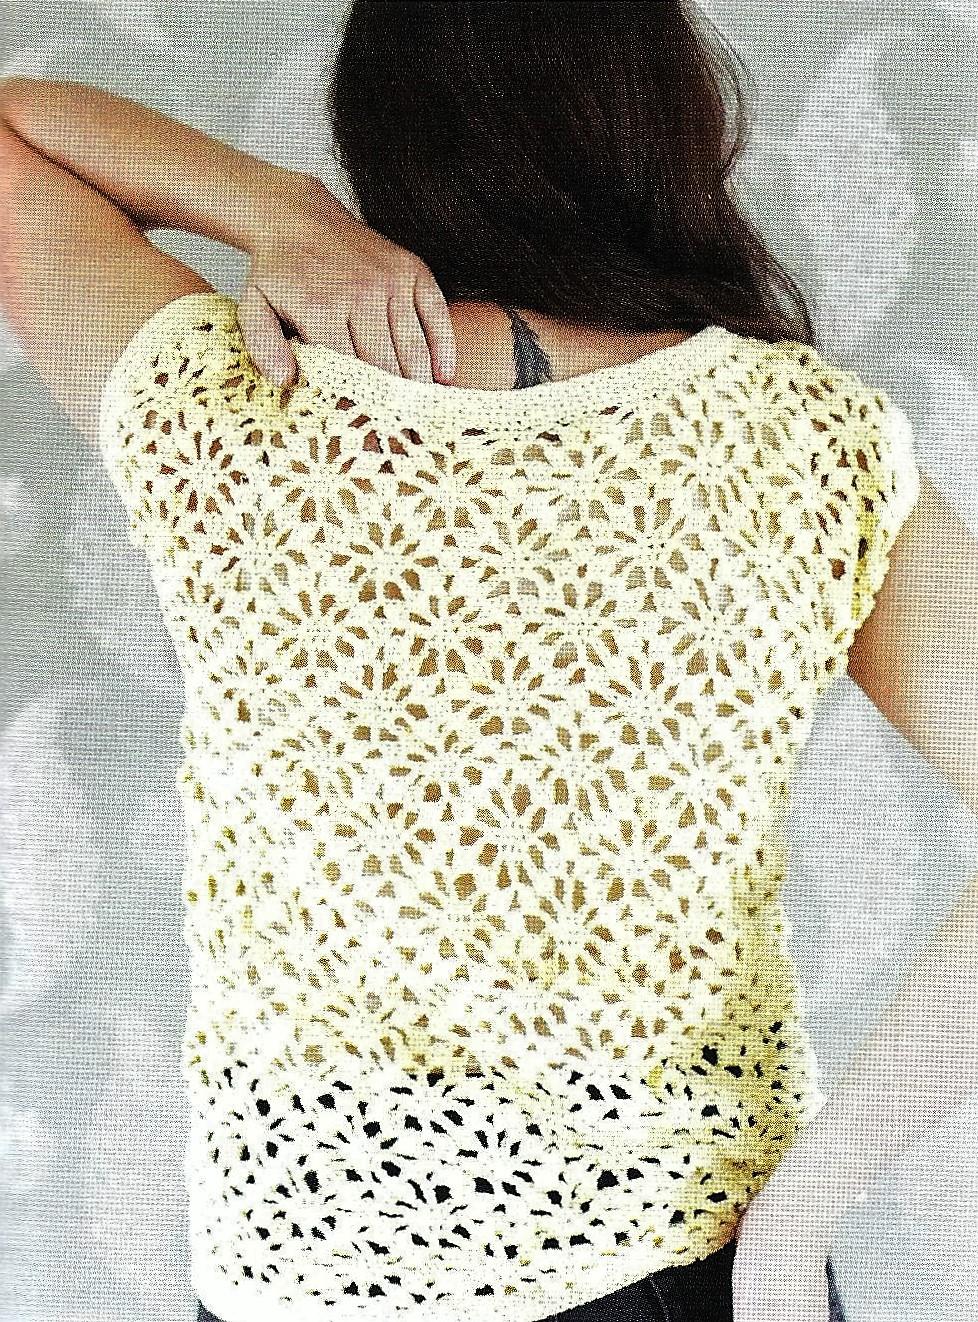 Crochet Square Motif Blouse Tutorial 69 Stitches Diagram